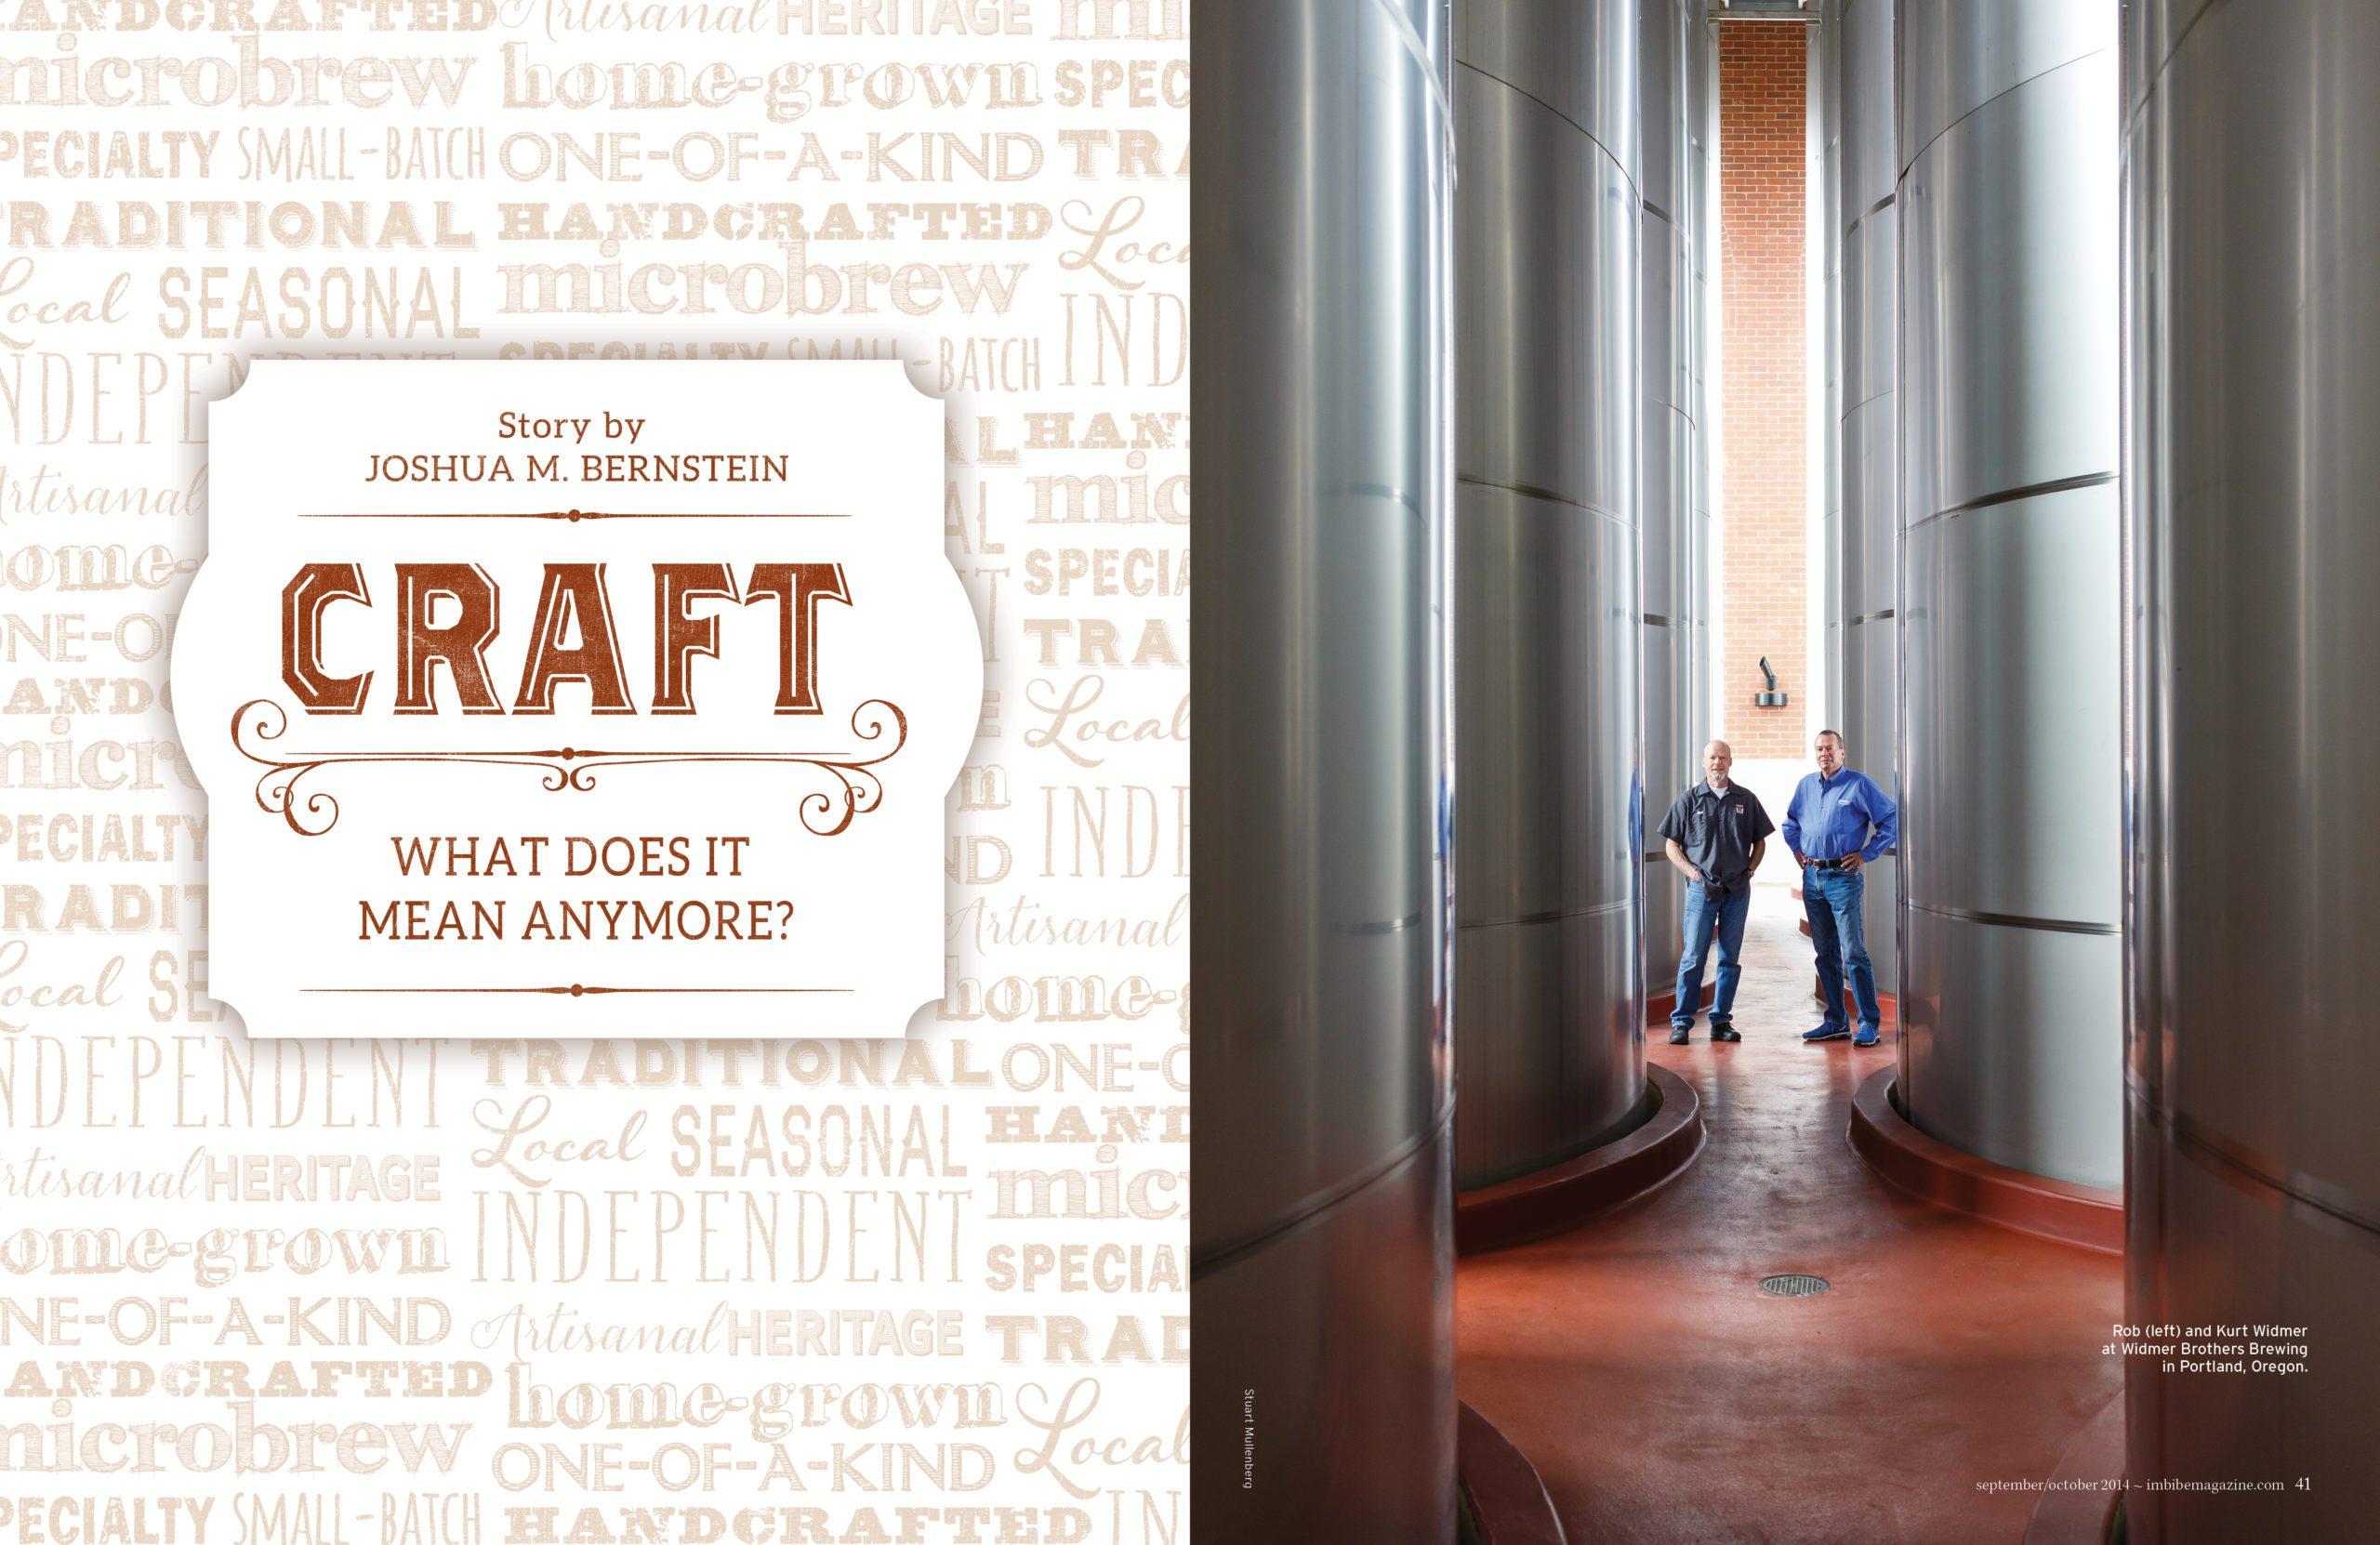 defining craft beer